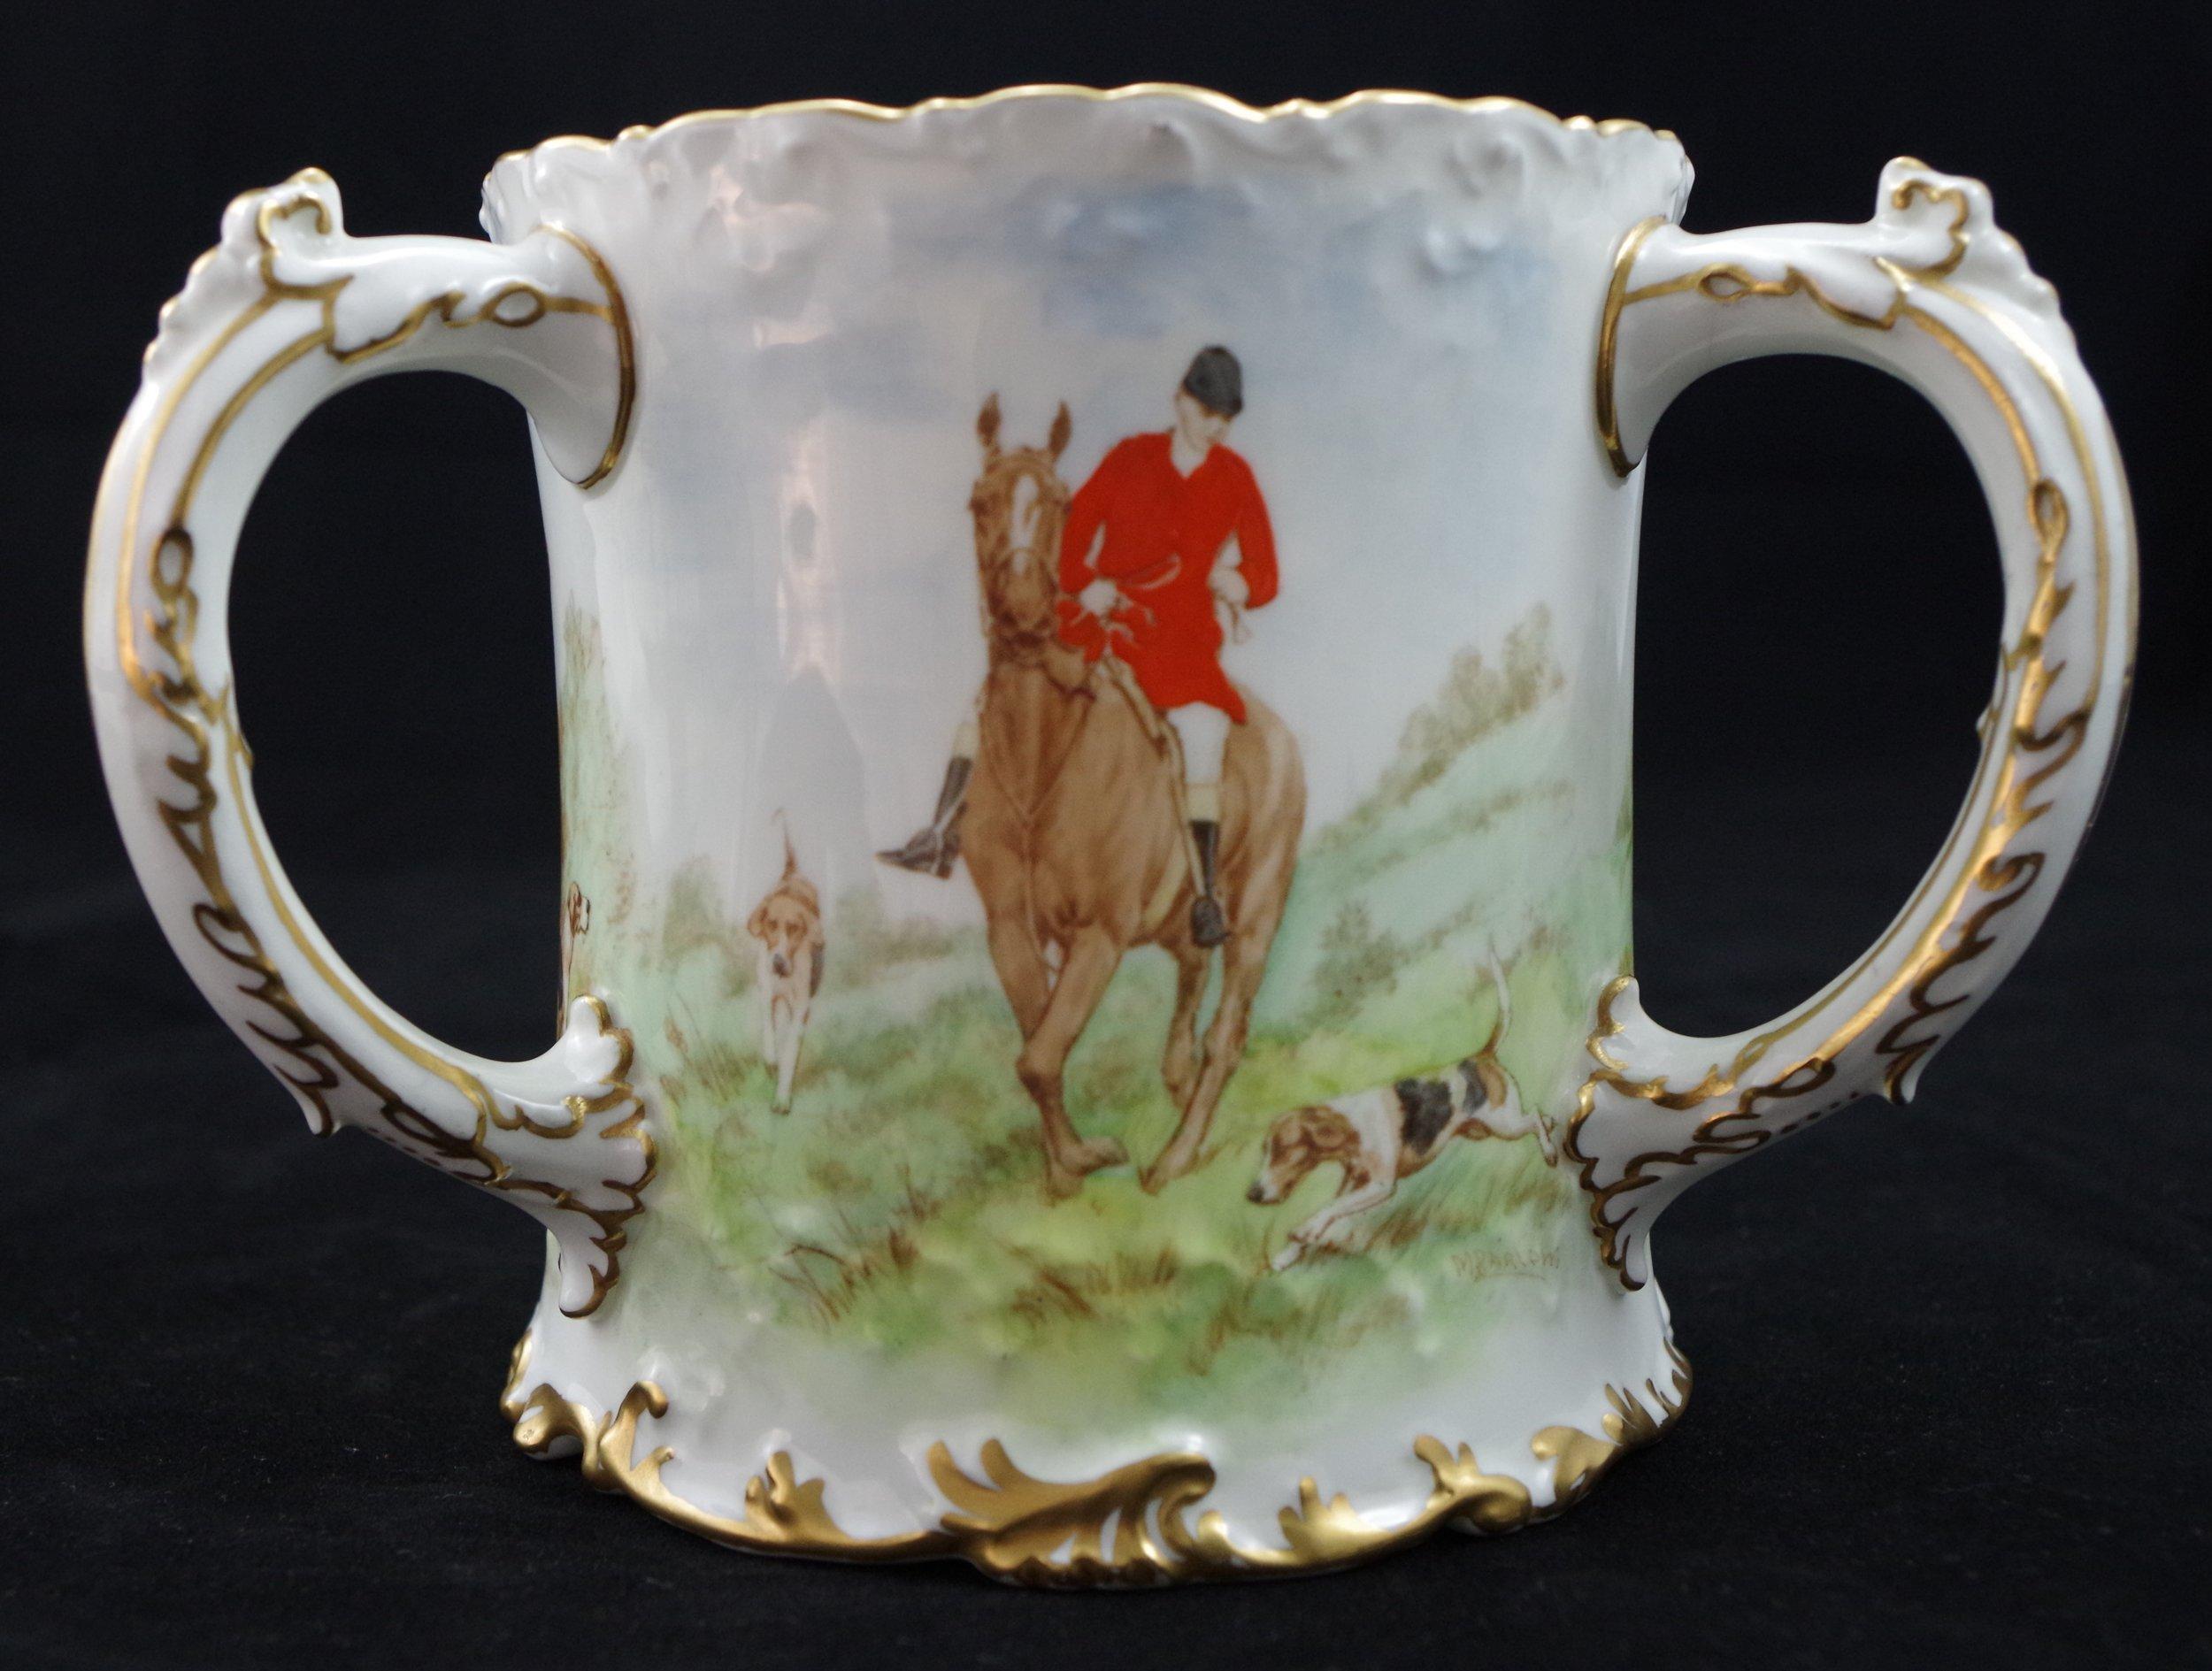 royal-crown-derby-tyg-rouen-shape-884-hunting-scene-barlow-side-3